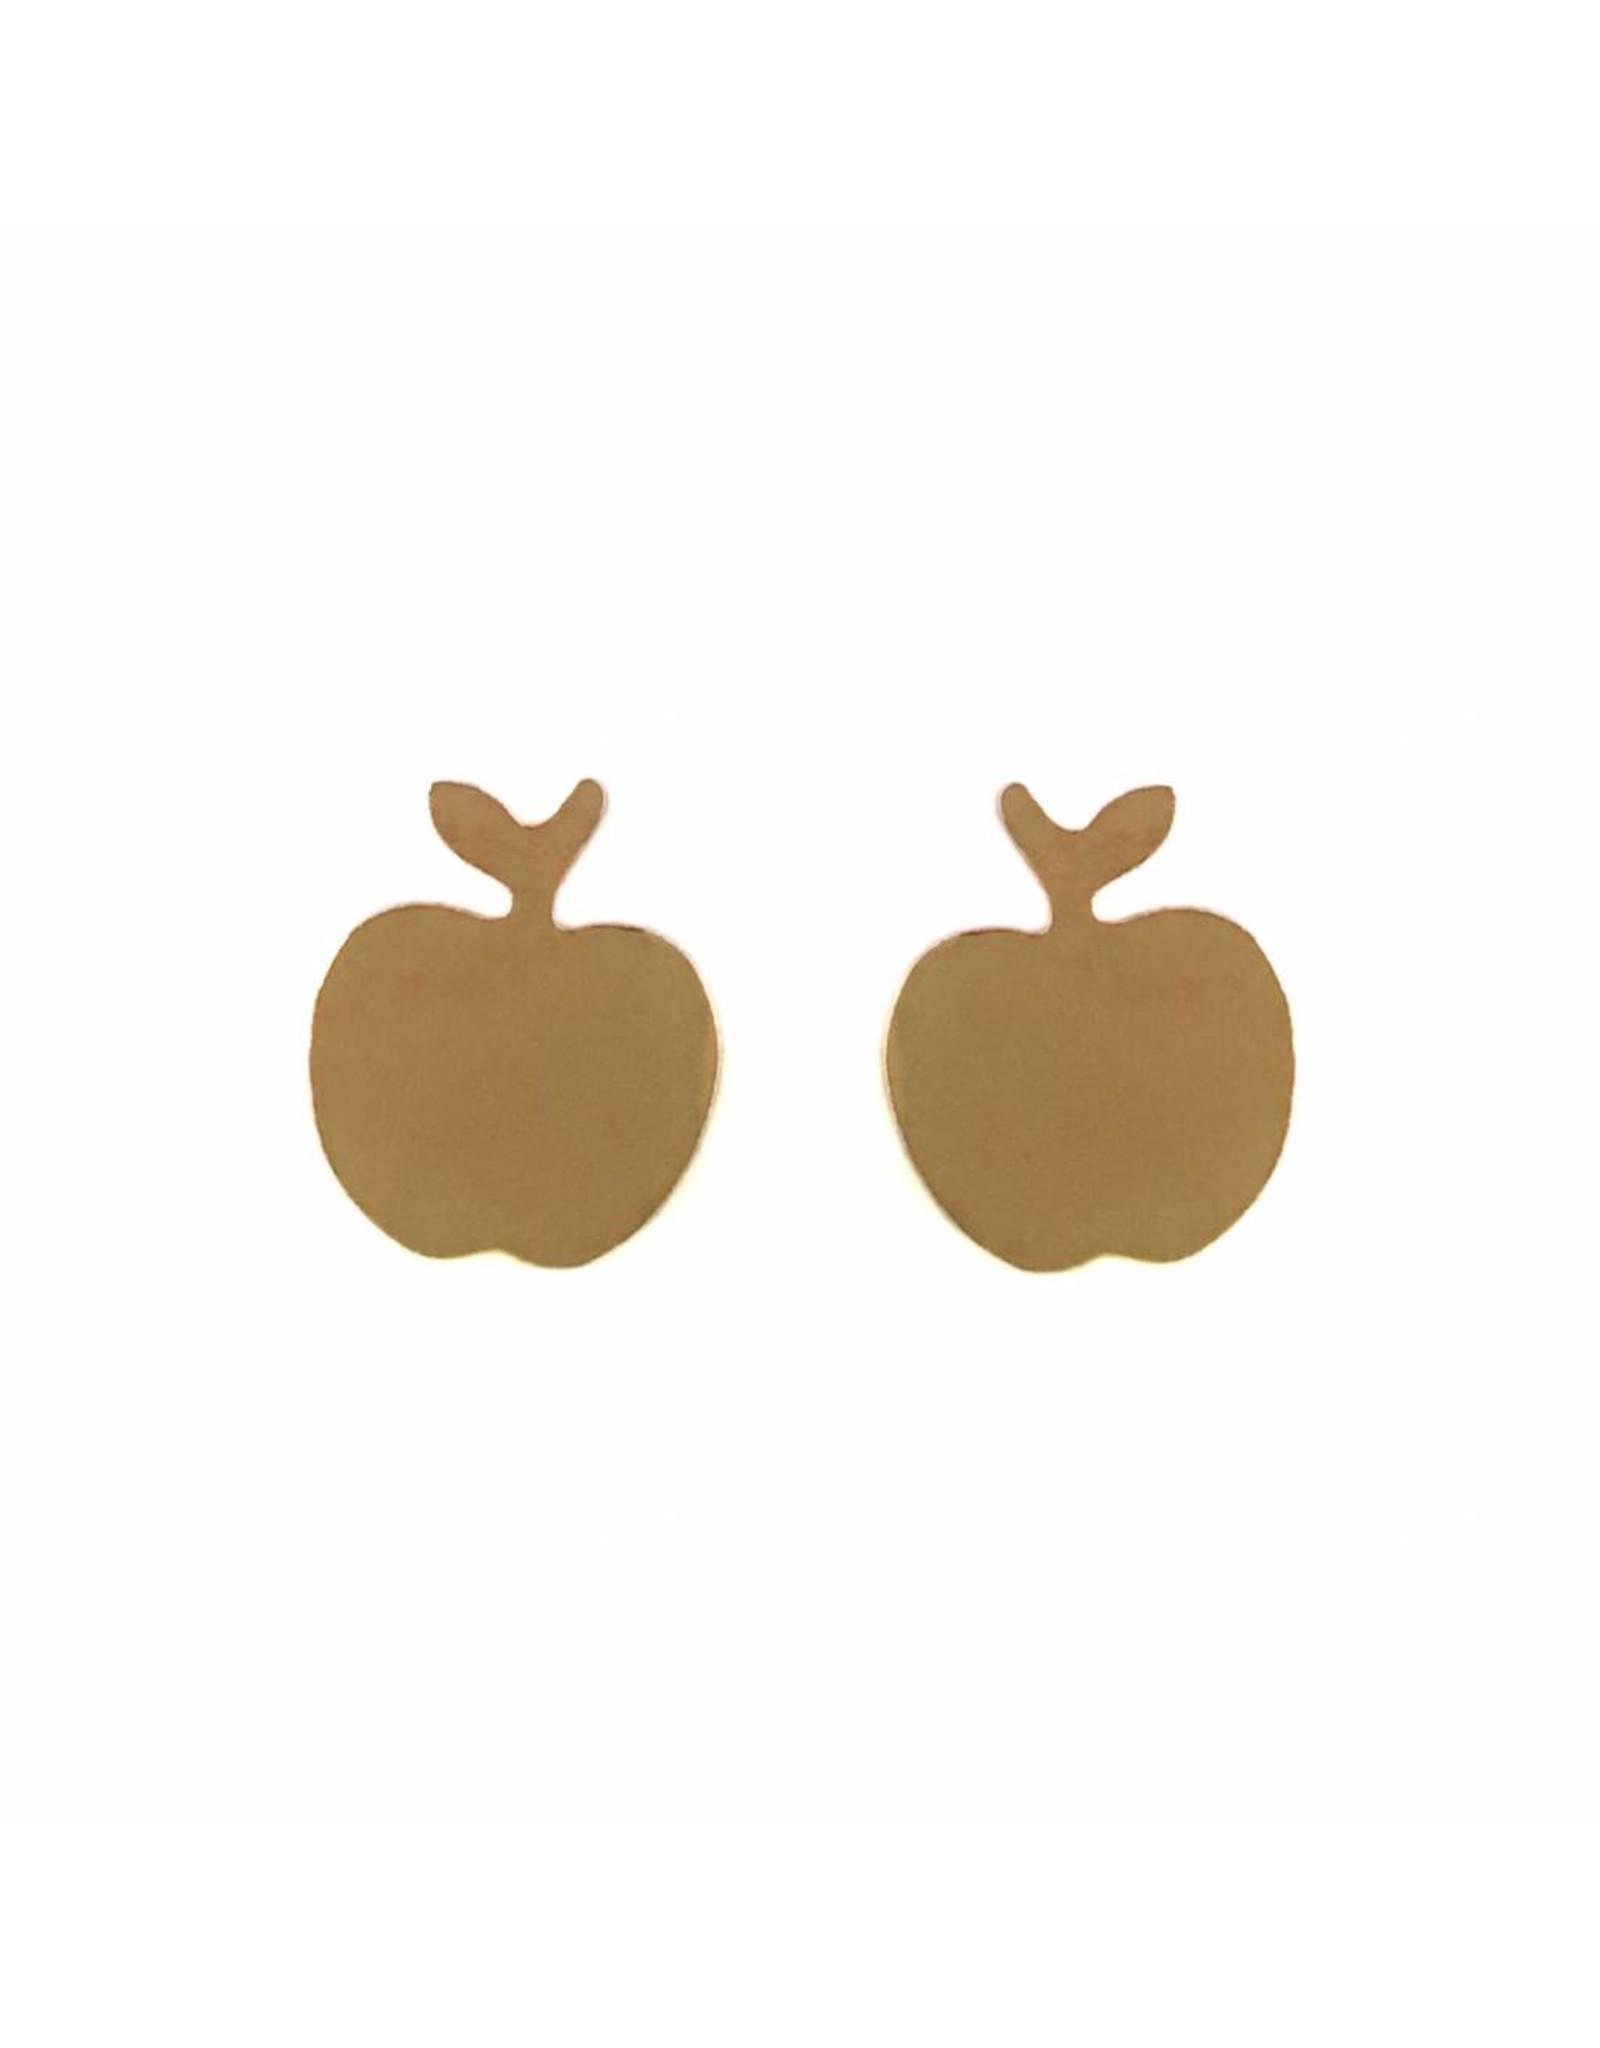 Stekertjes appel rose goudkleurig